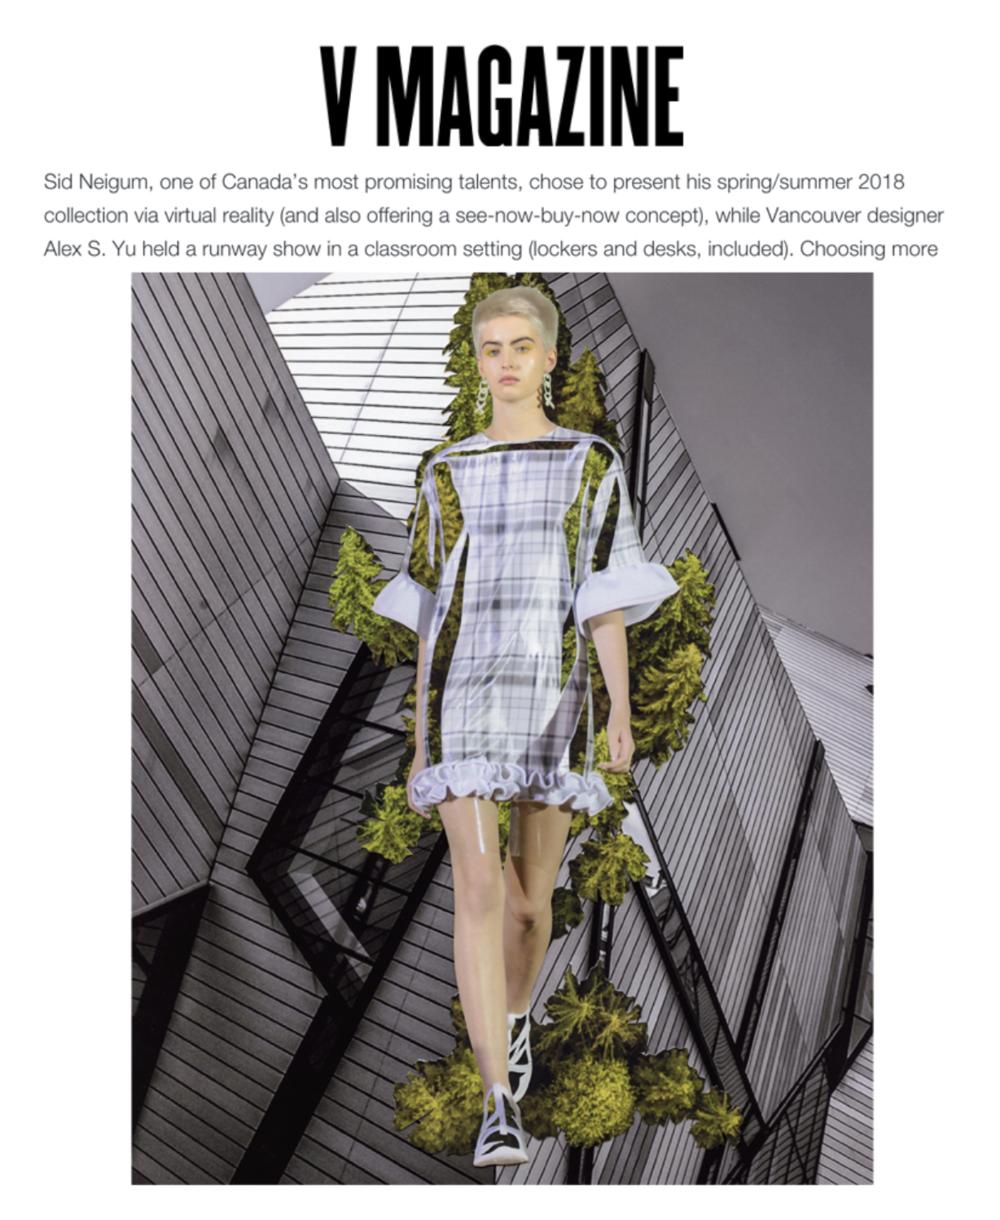 V Magazine (ALEX S. YU x JIWON CHOI Collaboration),LONDON, 2017